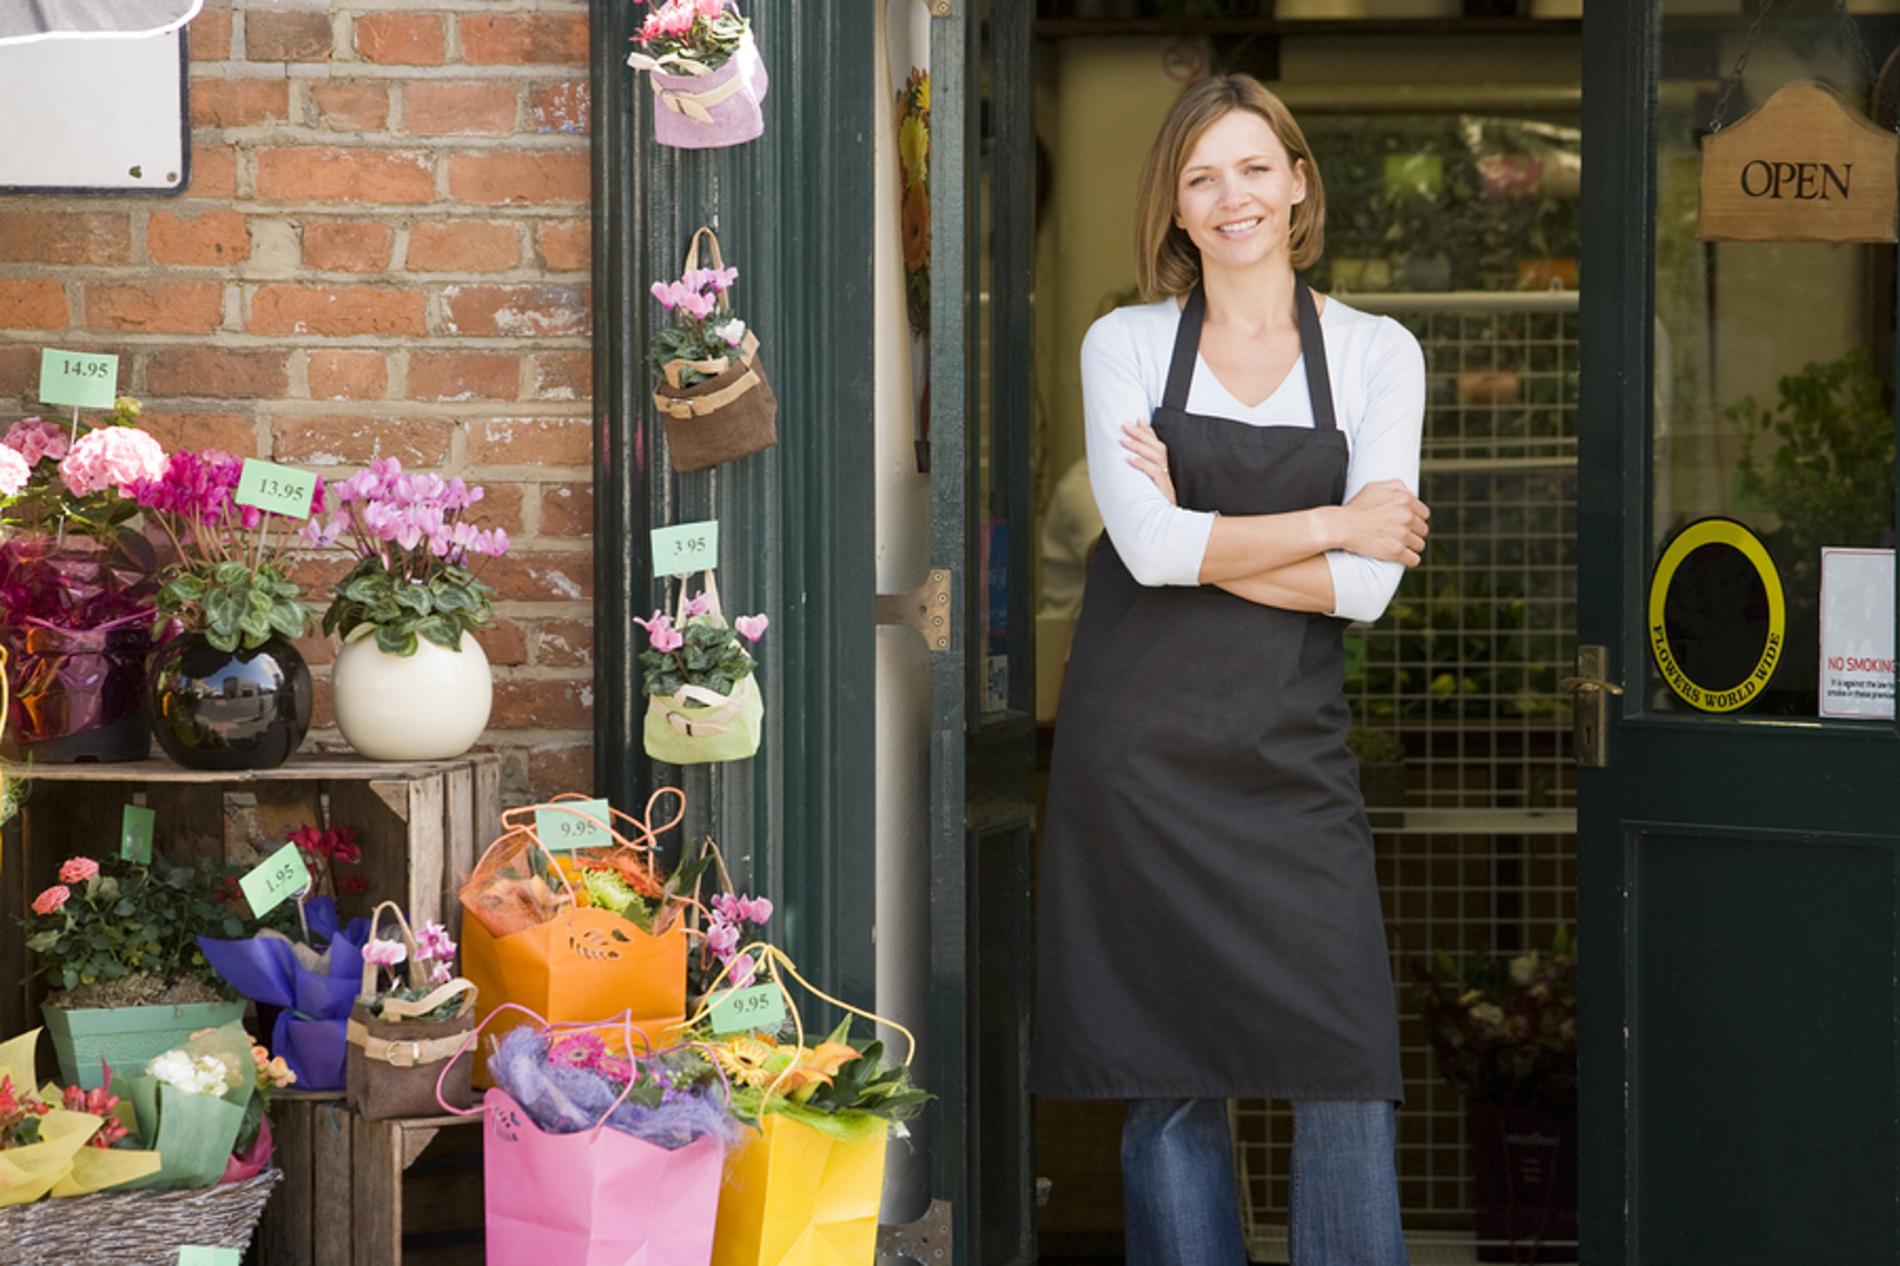 Woman shop owner standing in the entrance doorway.